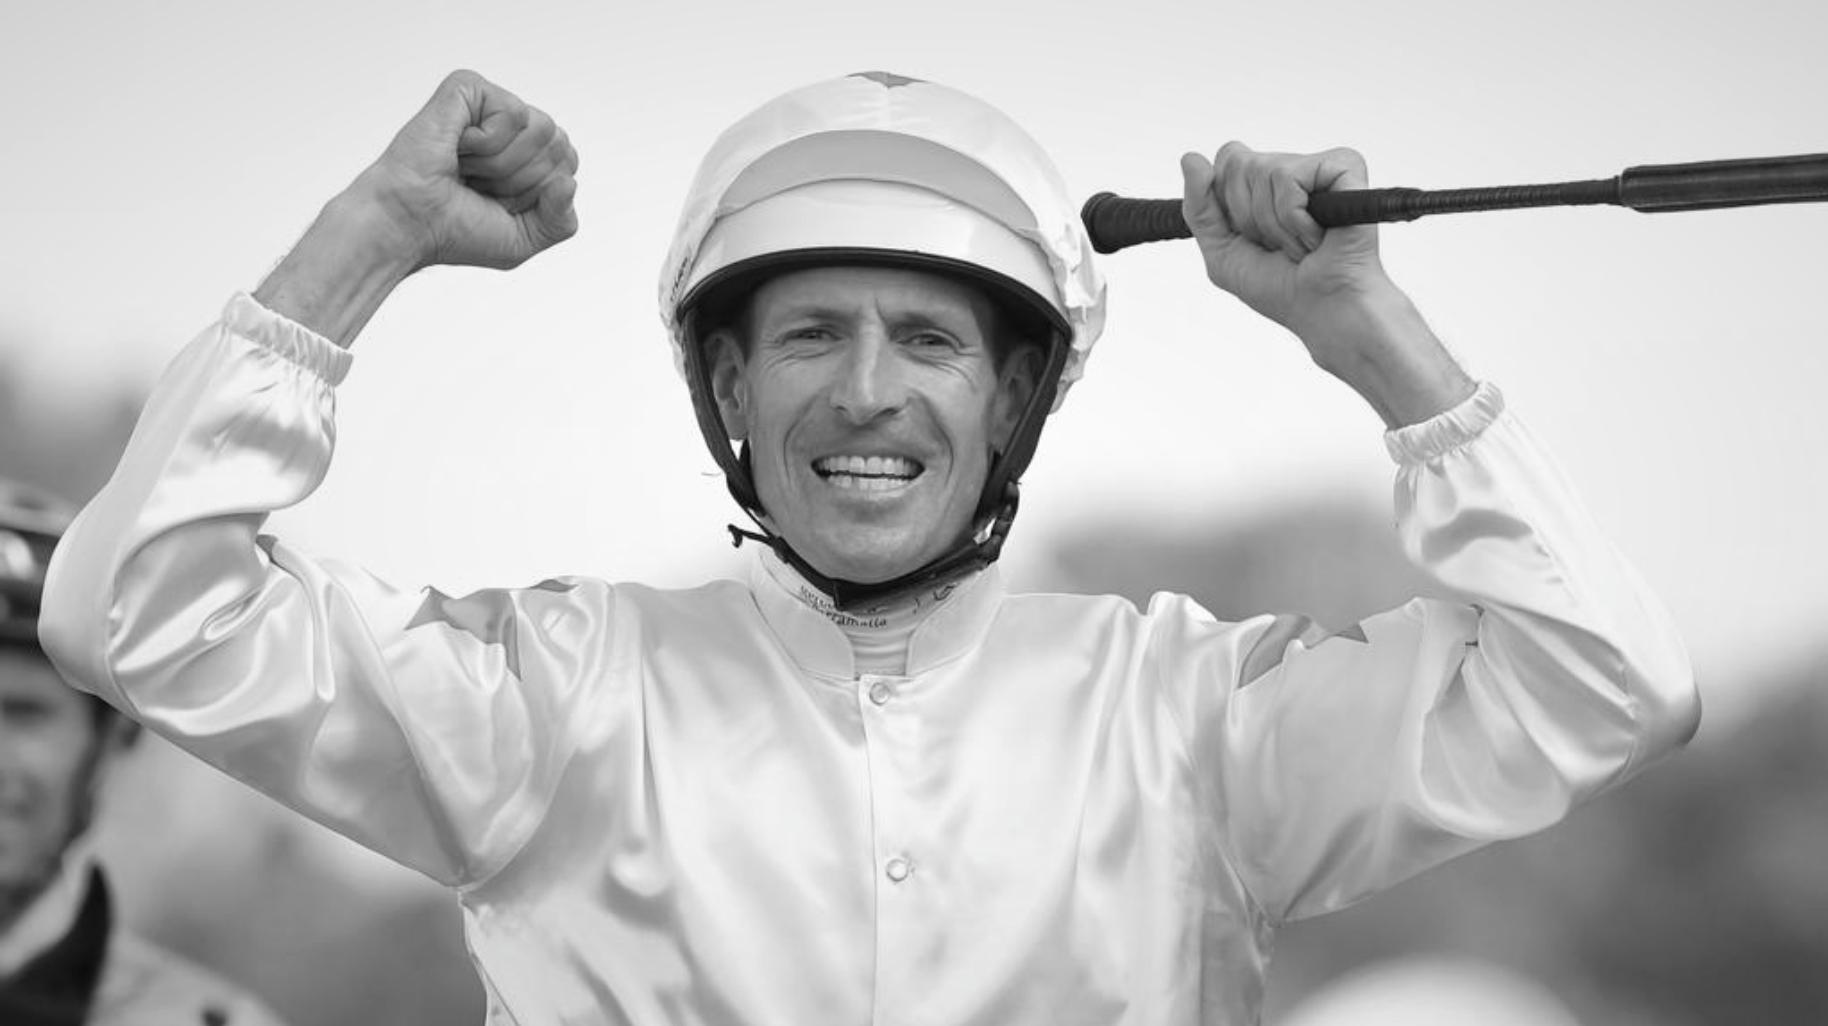 Hugh Bowman has suspension overturned for Farnan ride